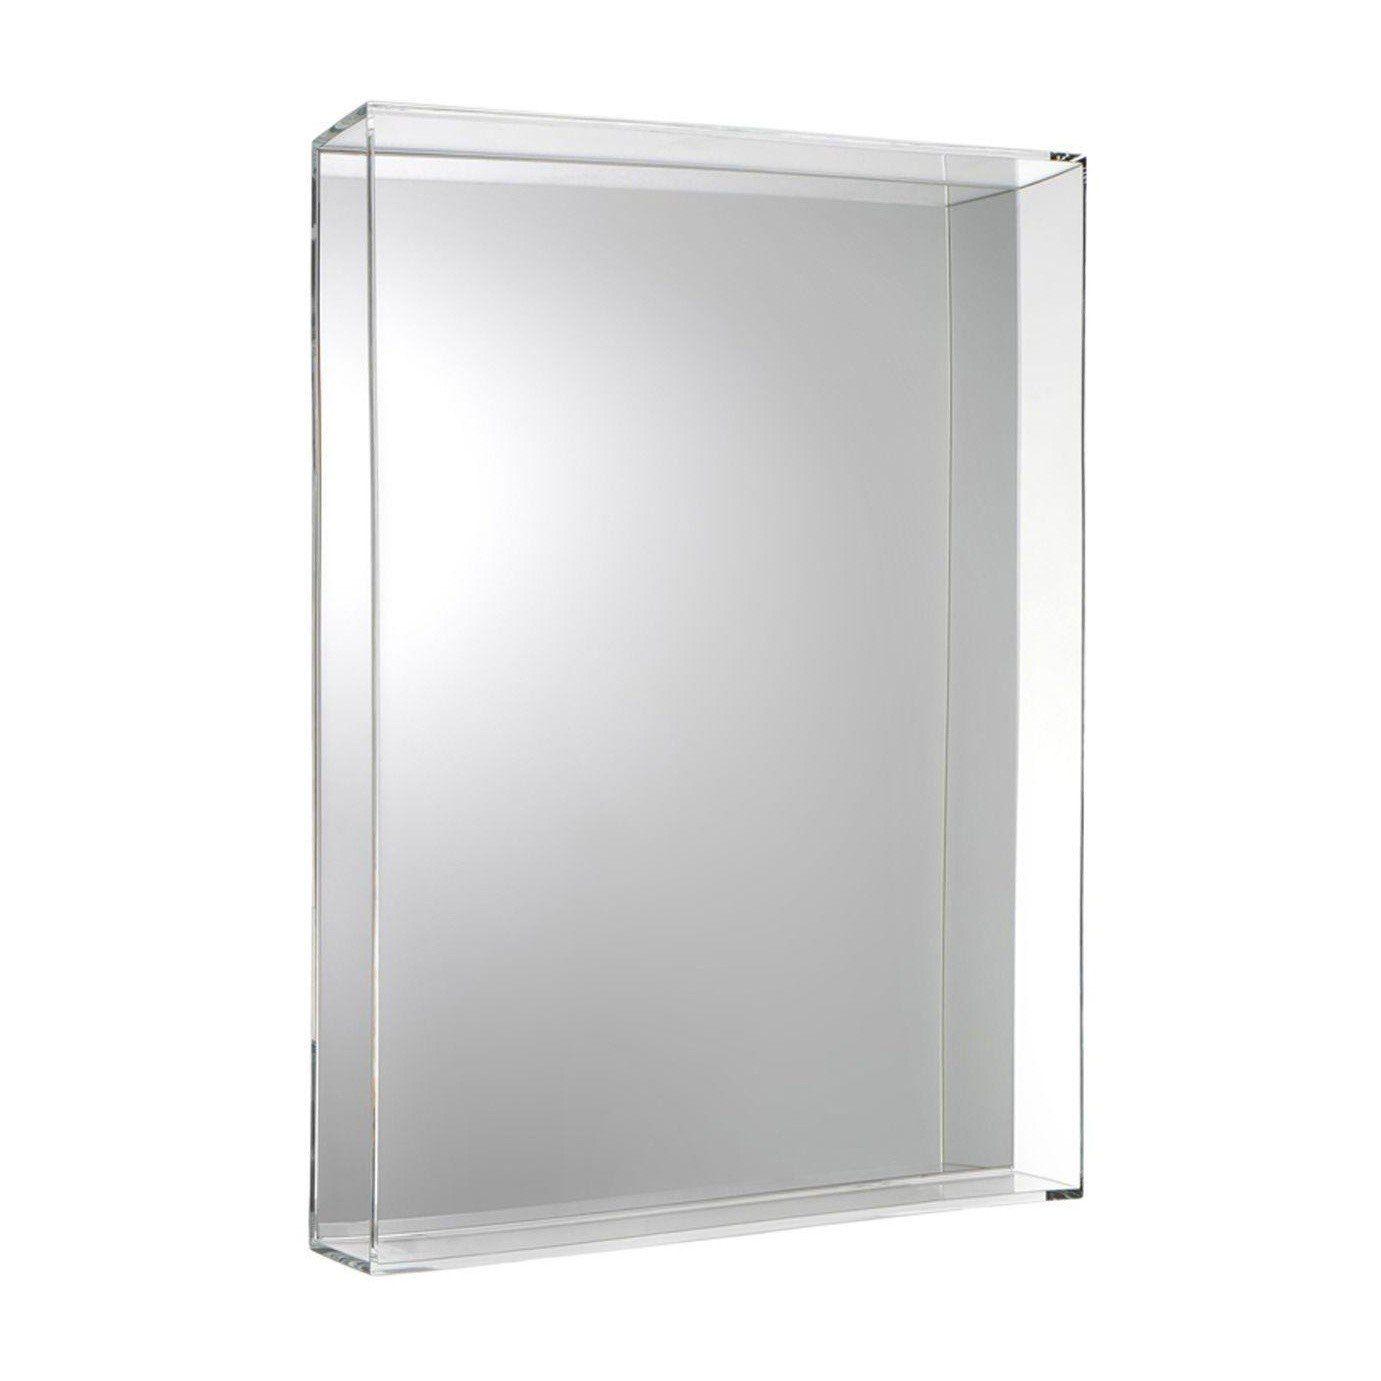 badspiegel 50x70 interesting kartell only me mirror black with badspiegel 50x70 trendy homcom. Black Bedroom Furniture Sets. Home Design Ideas